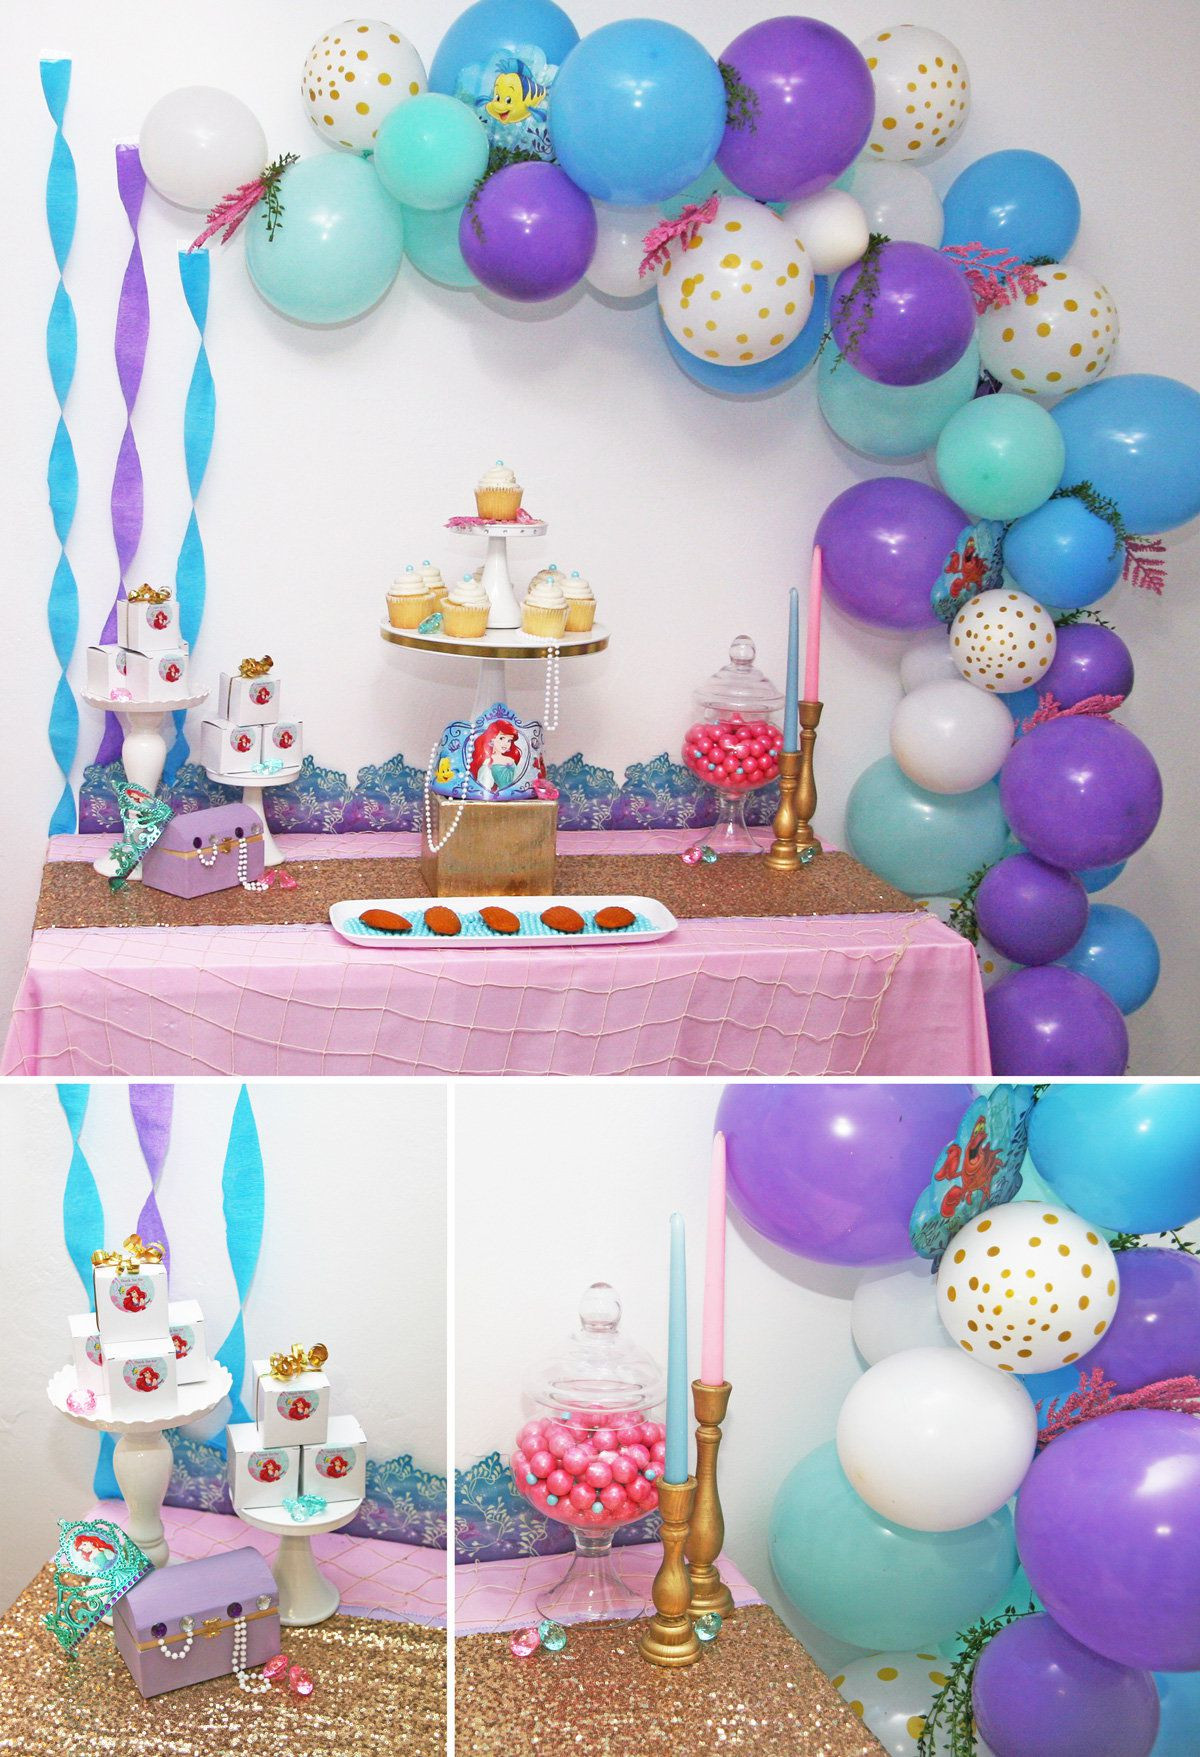 Ideas For Little Mermaid Birthday Party  Little Mermaid Party Ideas